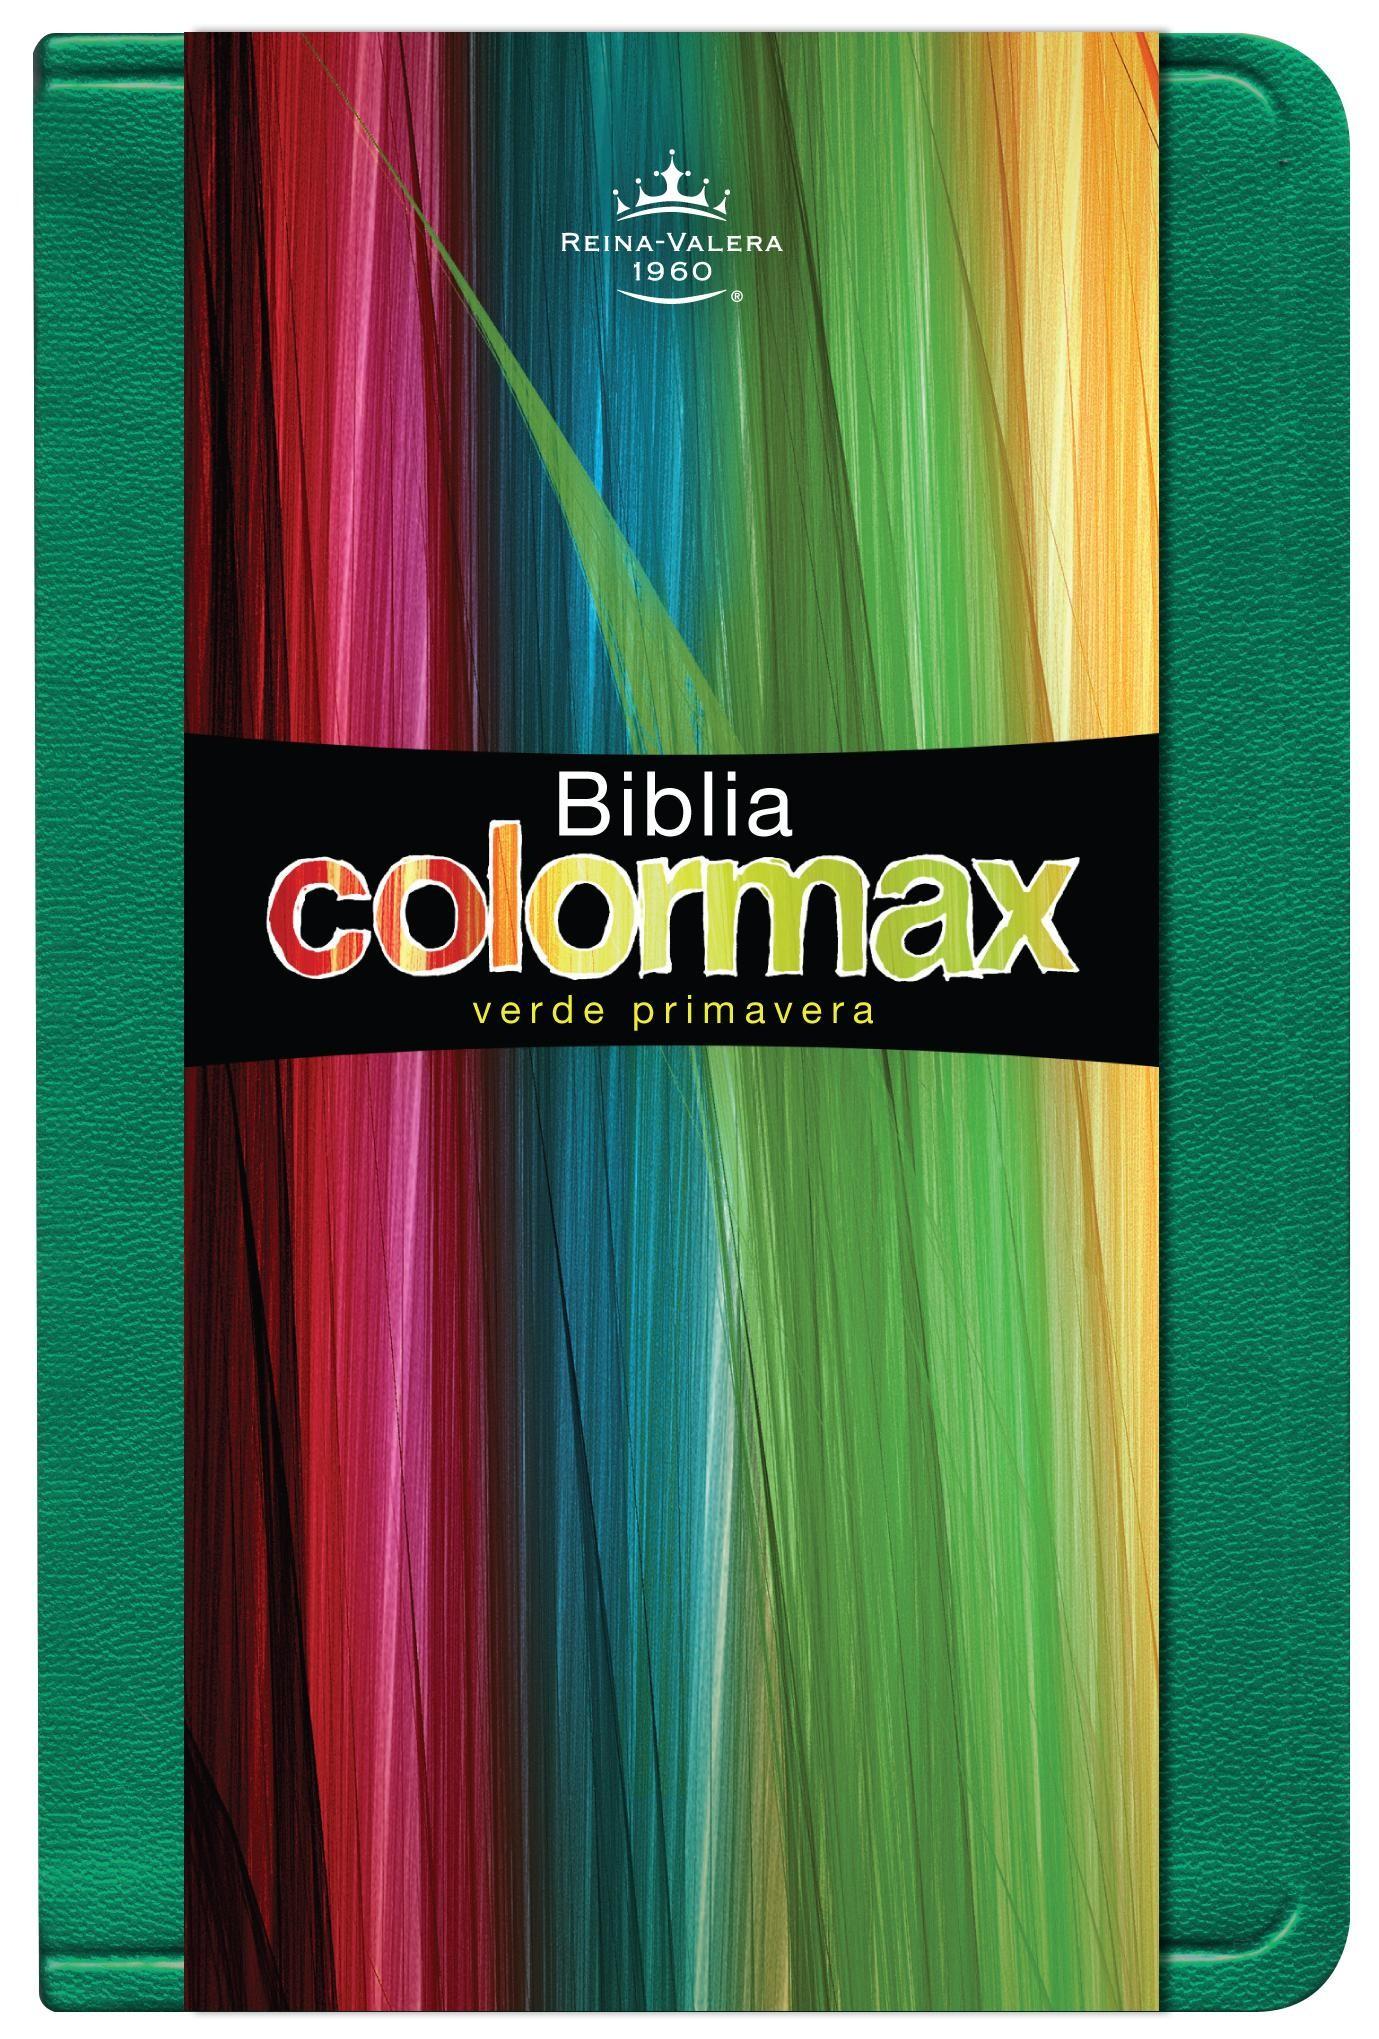 Biblia/RVR/Colormax/Verde Primavera